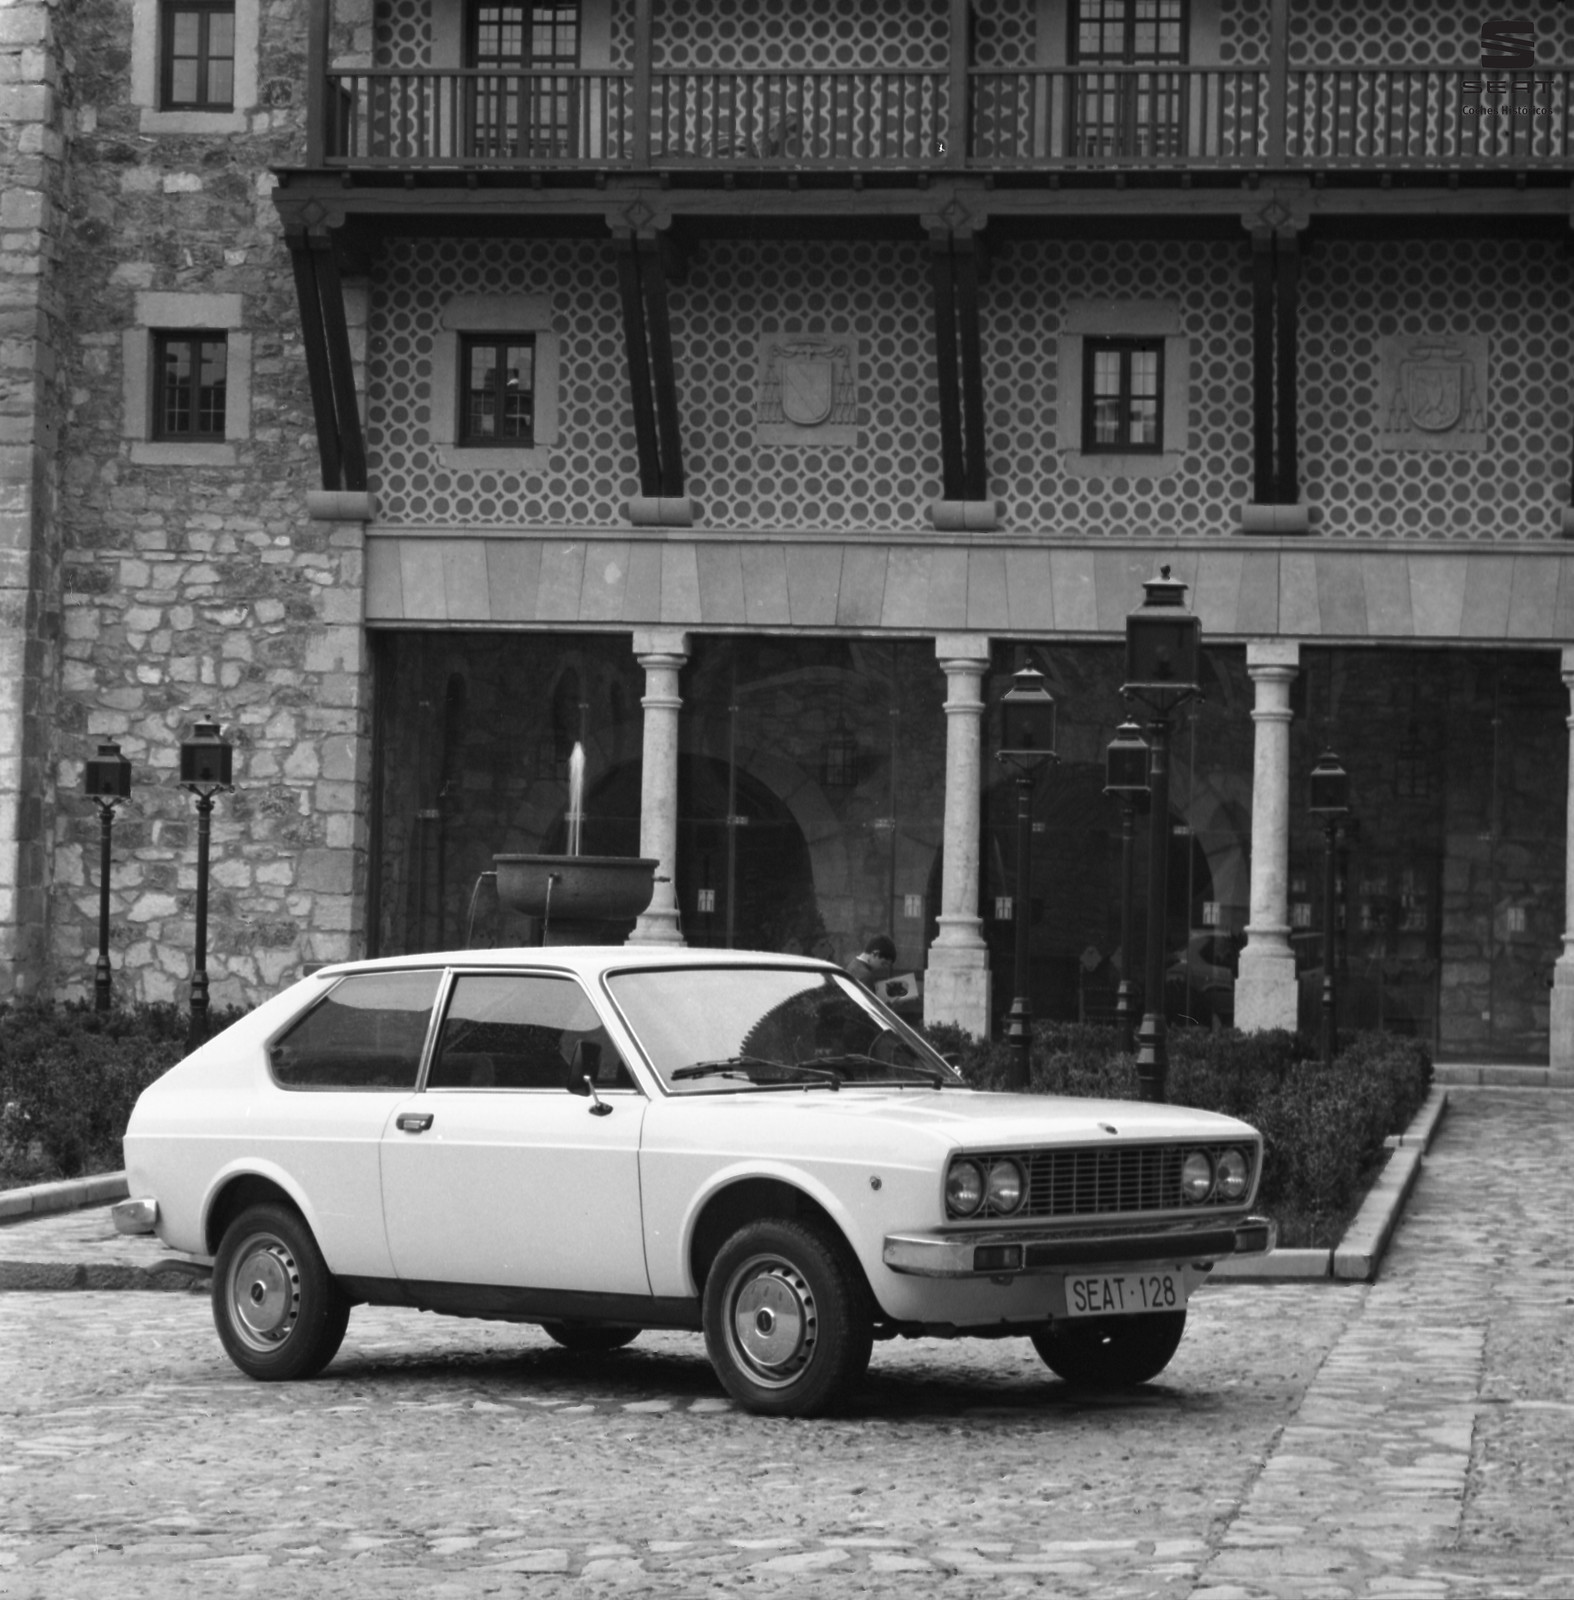 Foto de Motor SEAT 1430 - fotos históricas (12/49)